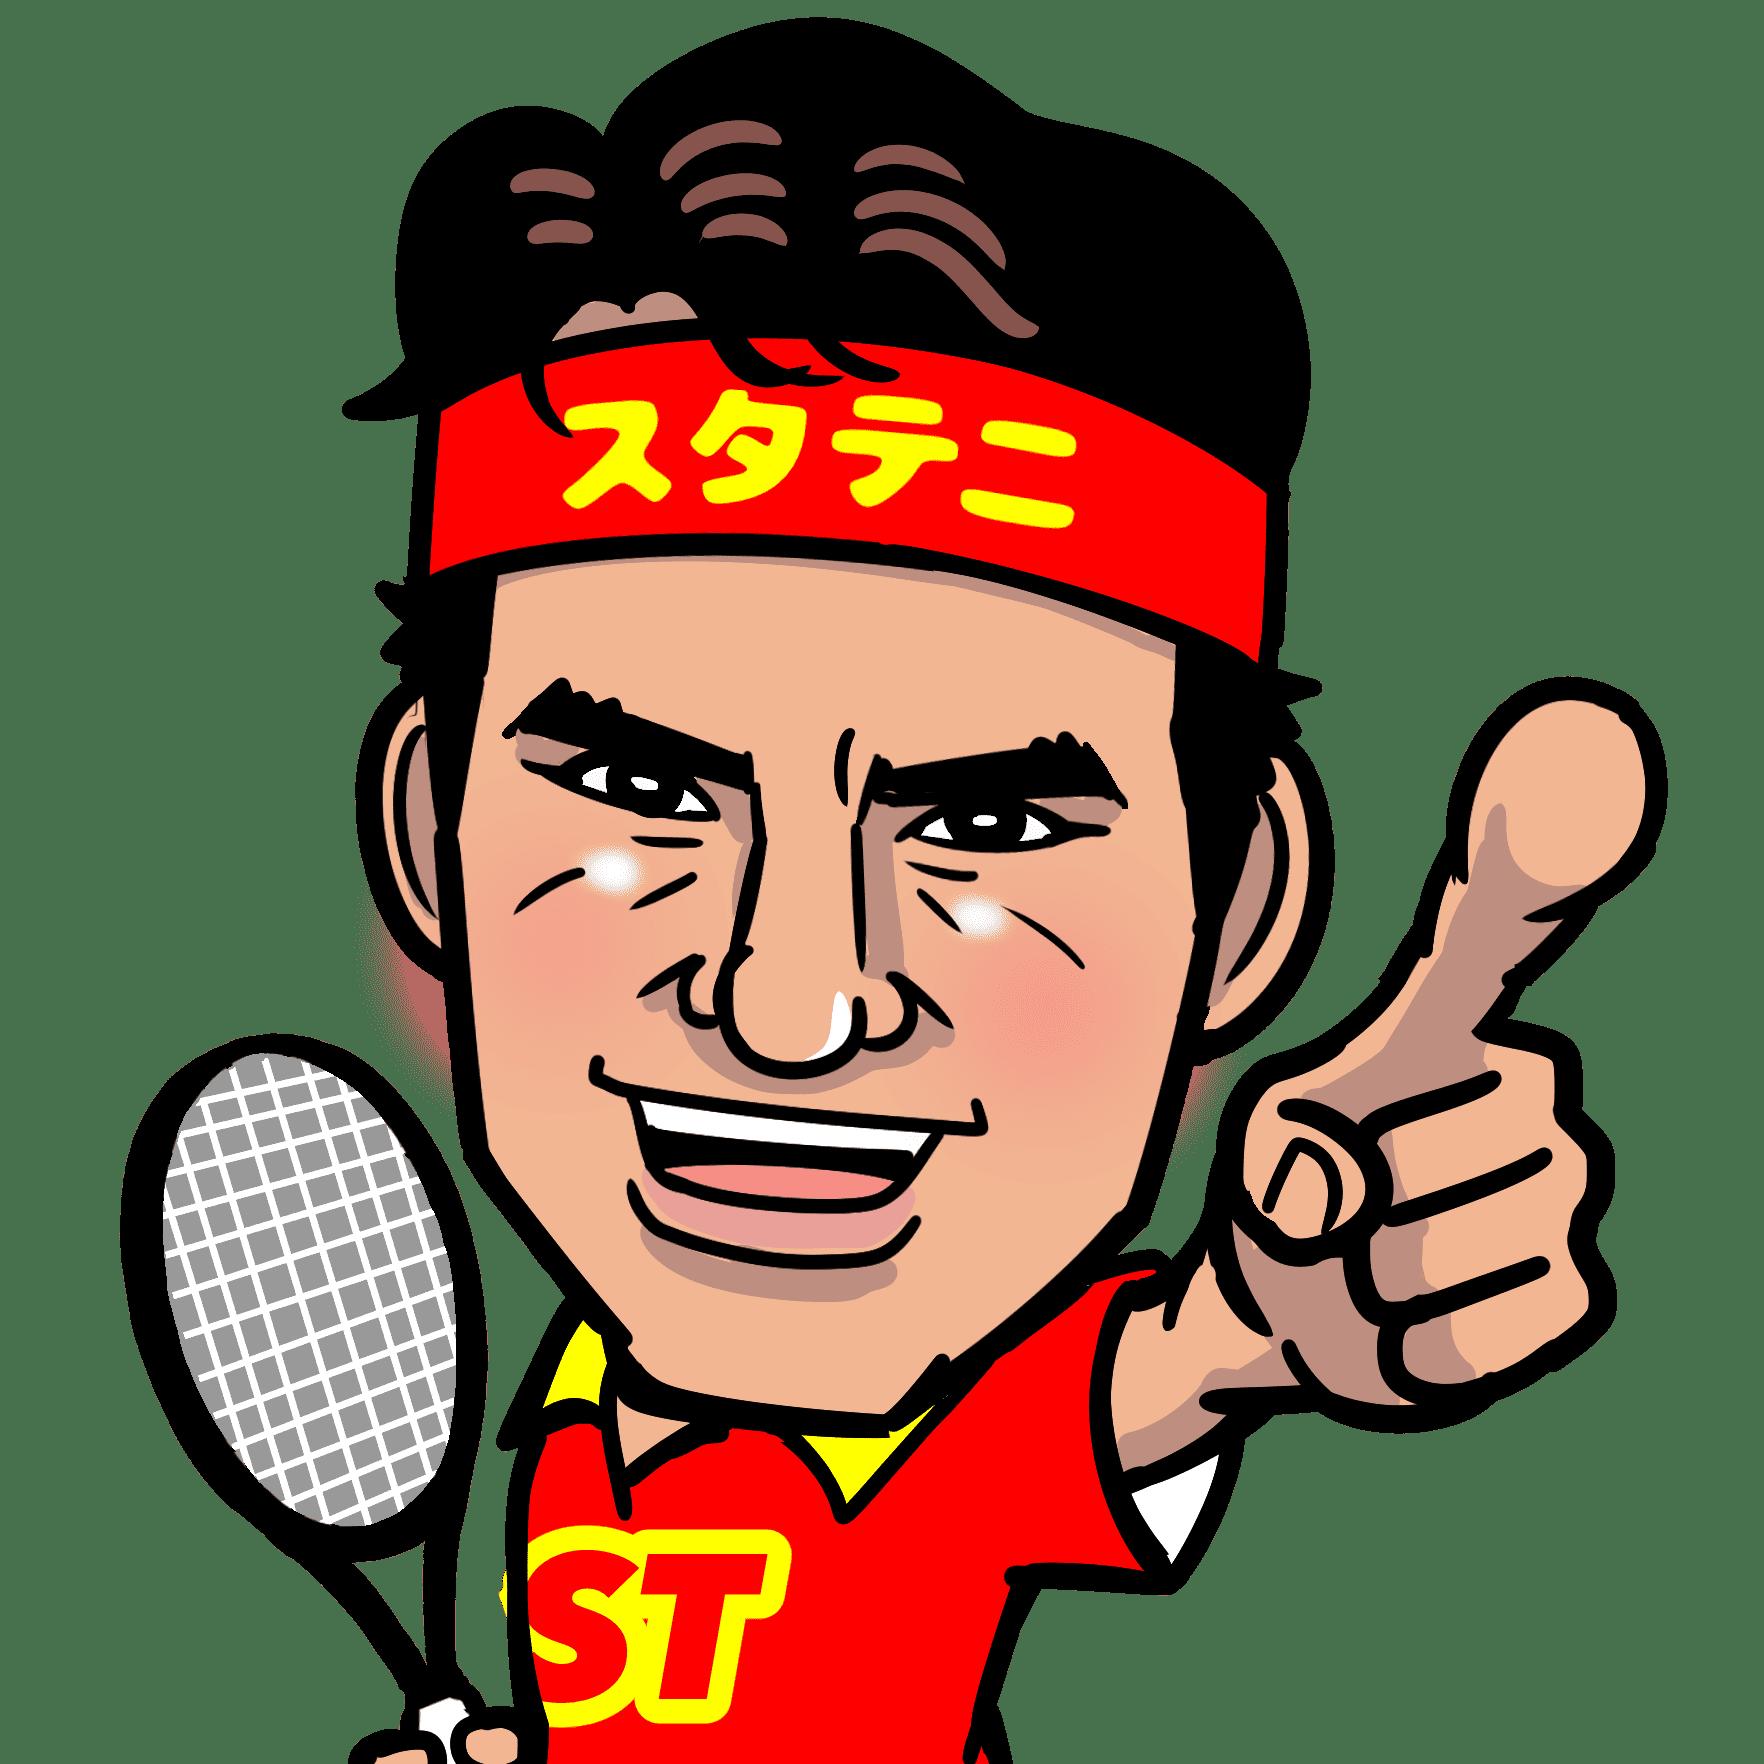 Vコア 100 2021 インプレ レビュー 【柔らかさ+スピンの反発系ラケット】